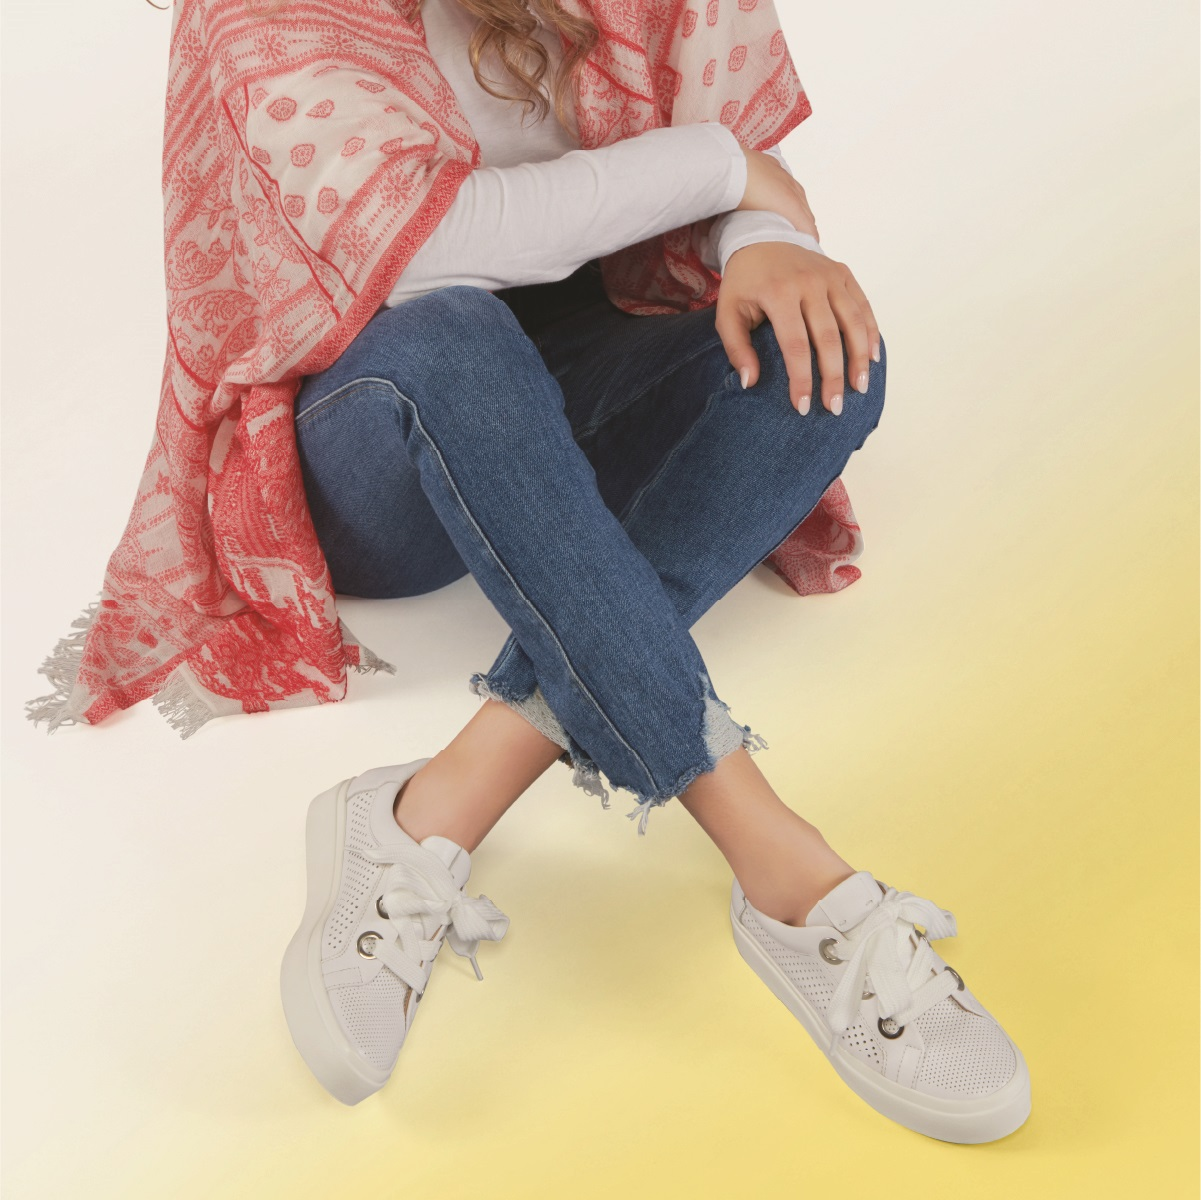 Buy Now, Wear Now! from Marmi